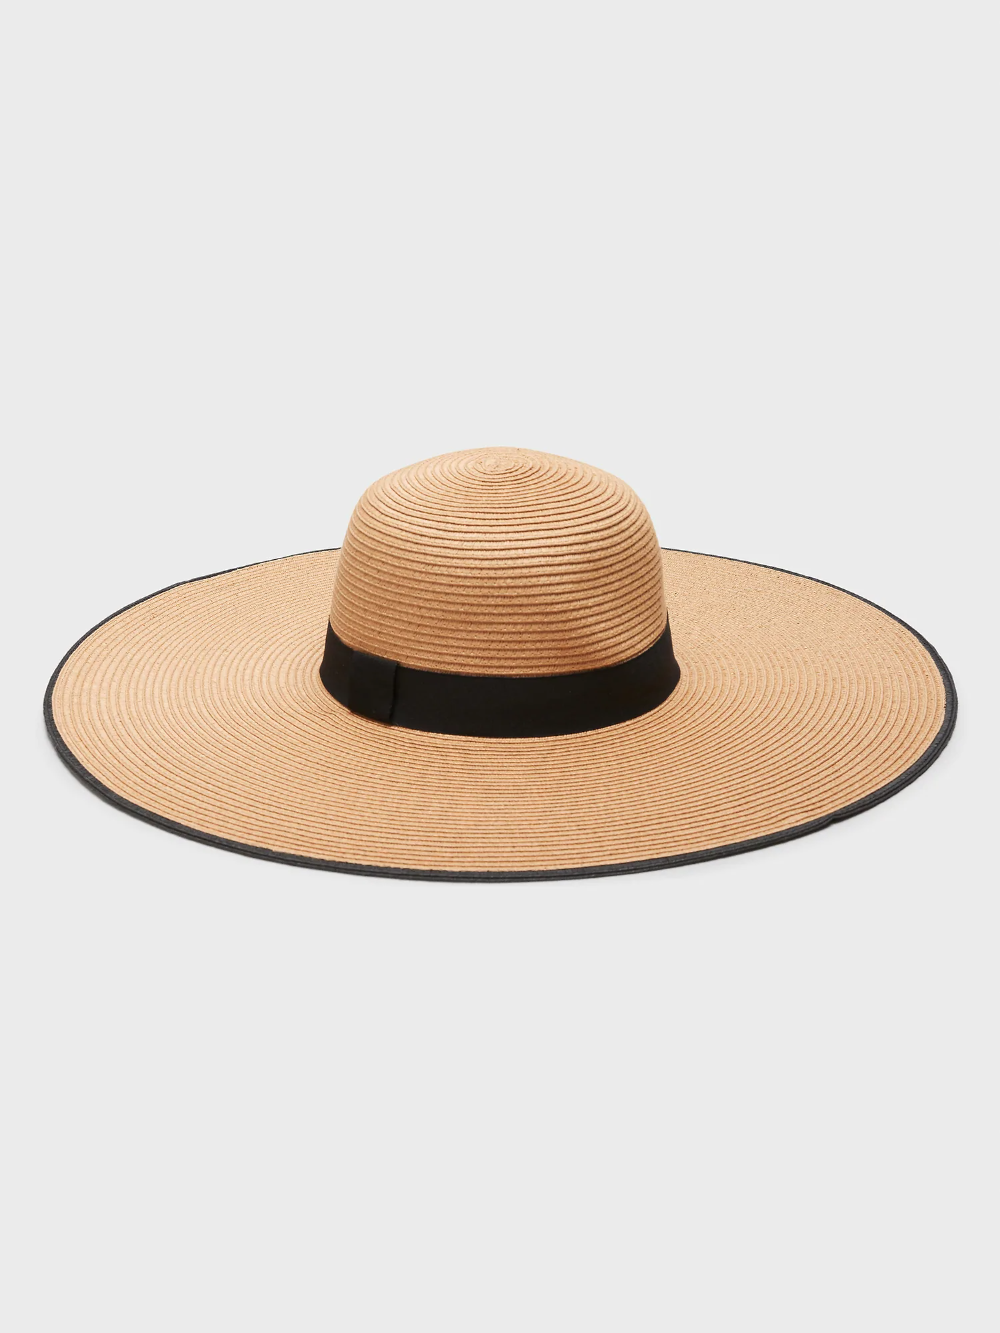 Beach Hat Banana Republic Factory In 2020 Straw Hat Beach Beach Hat Summer Hats For Women